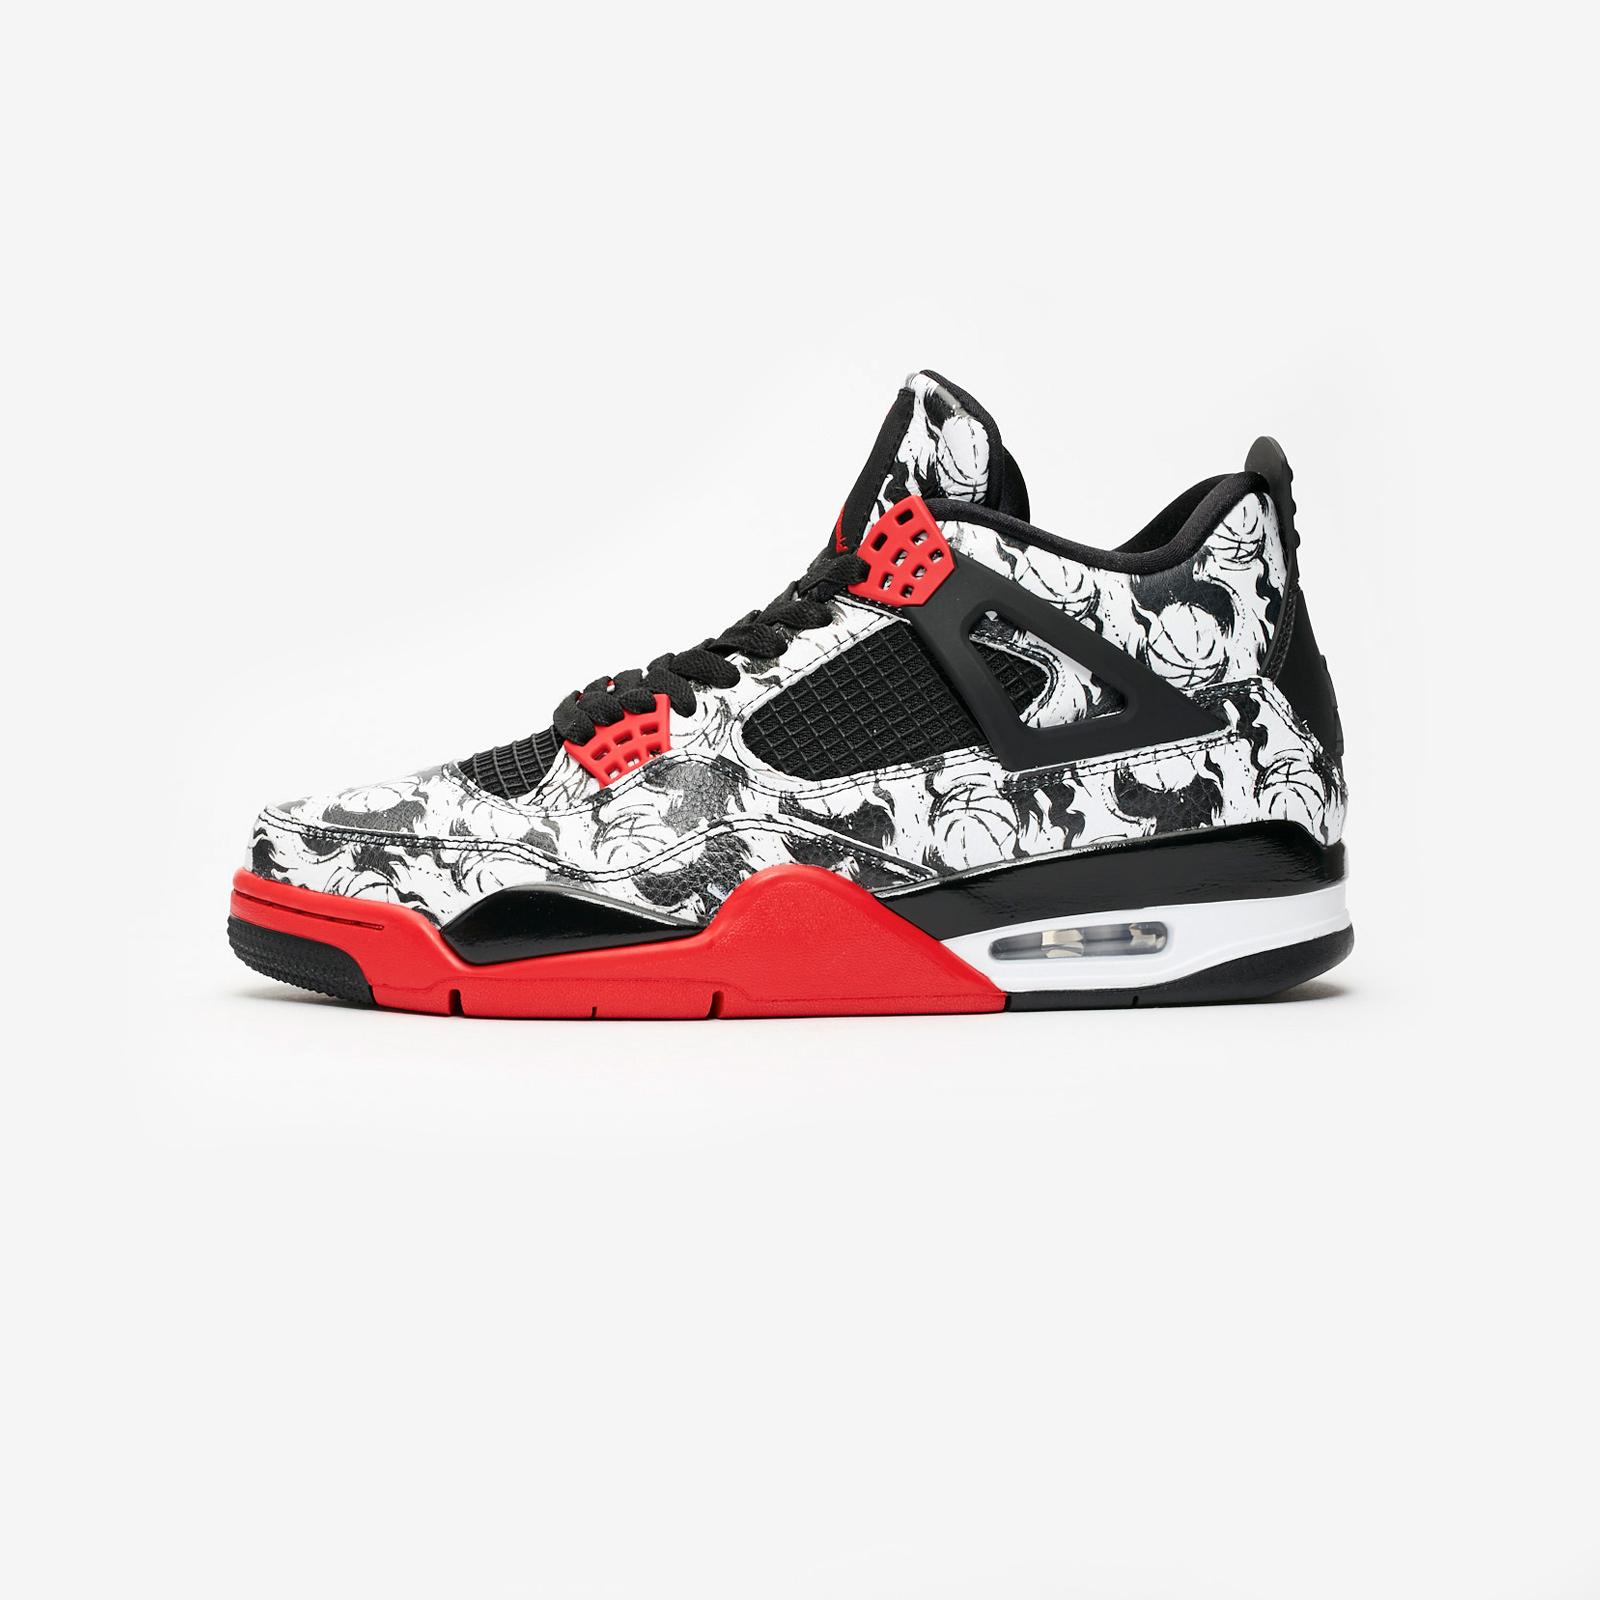 differently 77697 97453 Jordan Brand Air Jordan 4 Tattoo - Bq0897-006 - Sneakersnstuff   sneakers    streetwear online since 1999